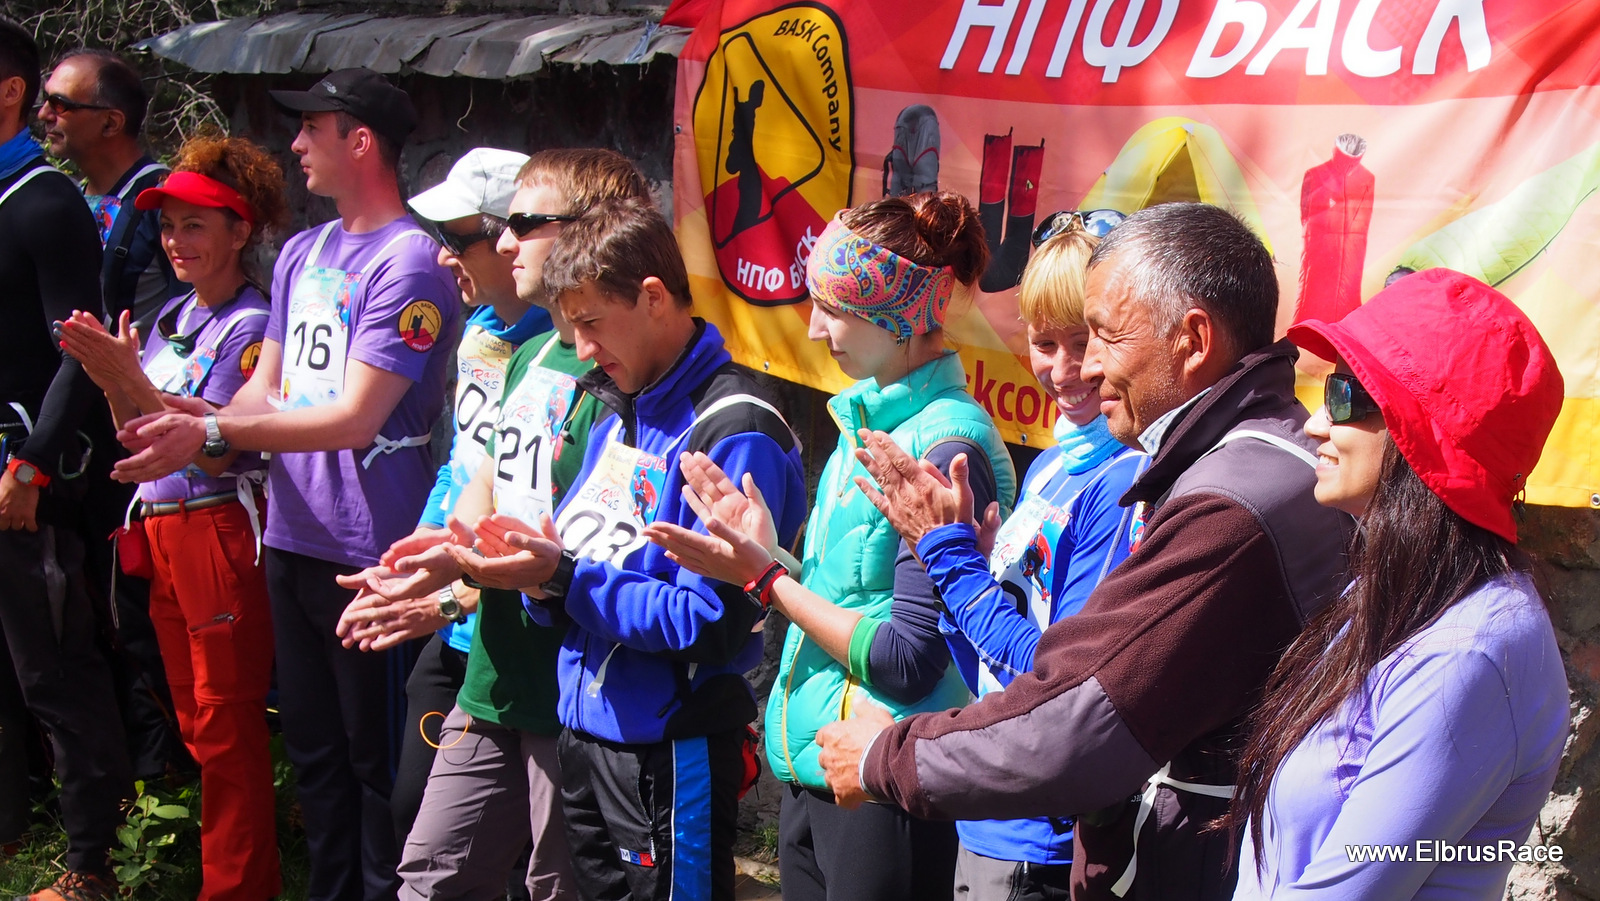 elbrus-race-2014-mars-one-ritika-singh-004